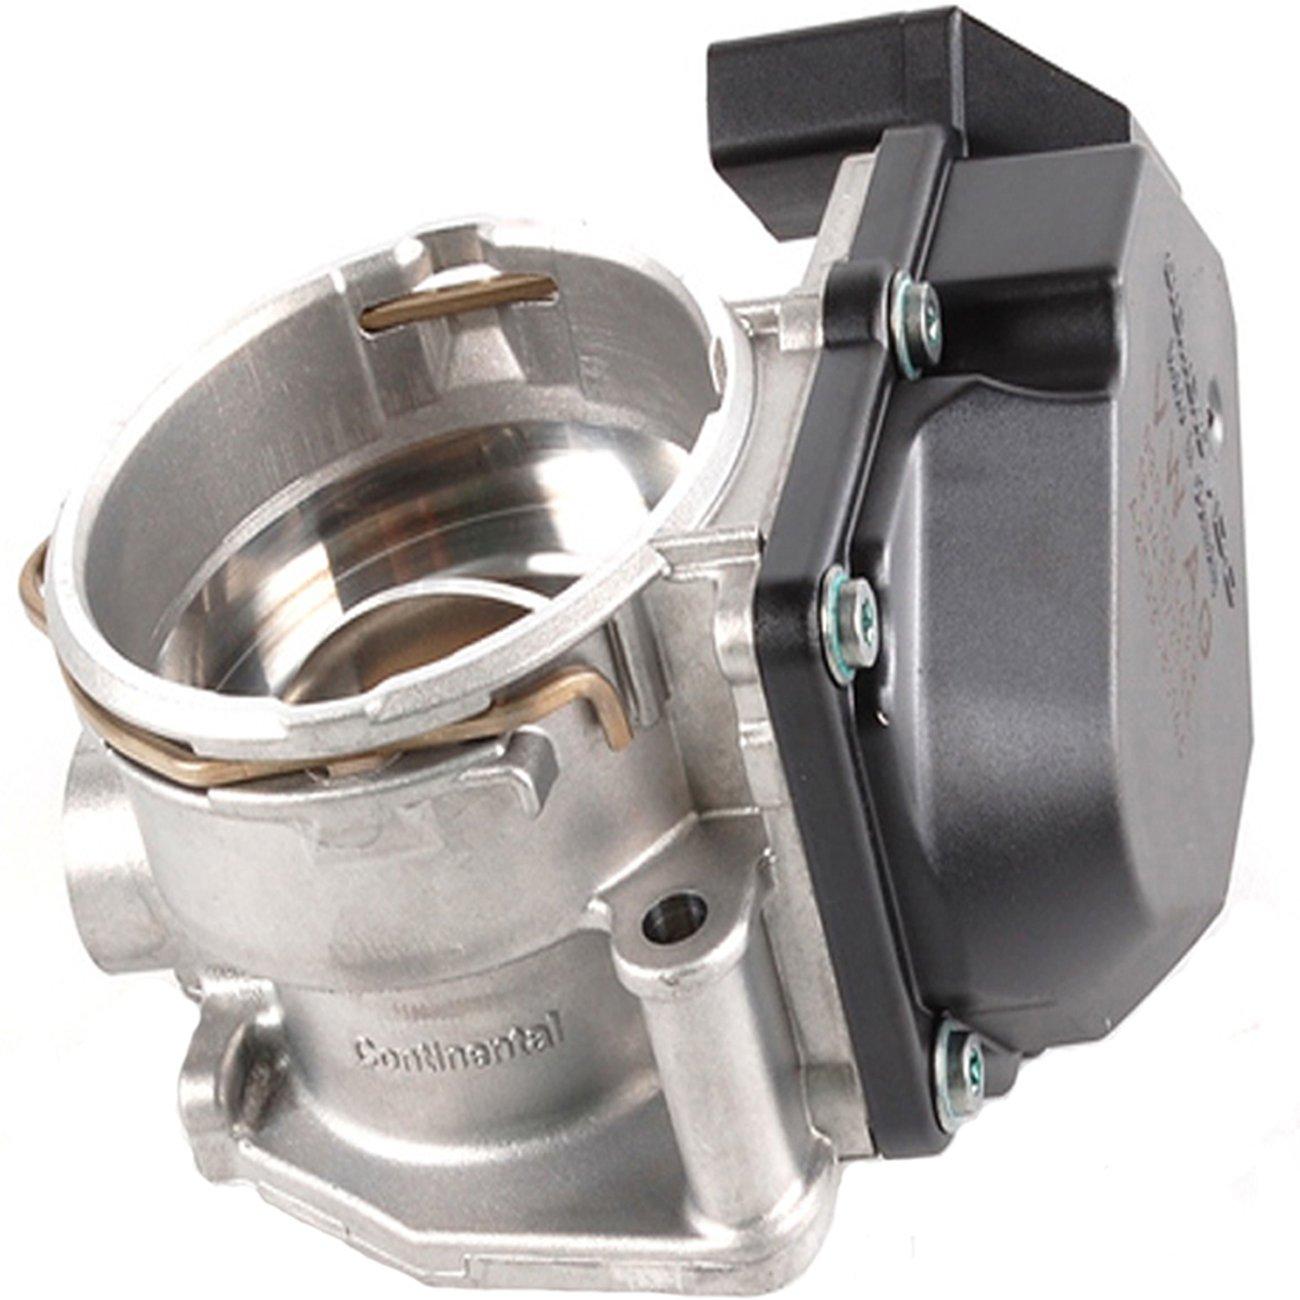 Bapmic 03G128063Q Fuel Injection Throttle Body for Audi A3 Volkswagen Jetta Passat Audi A3